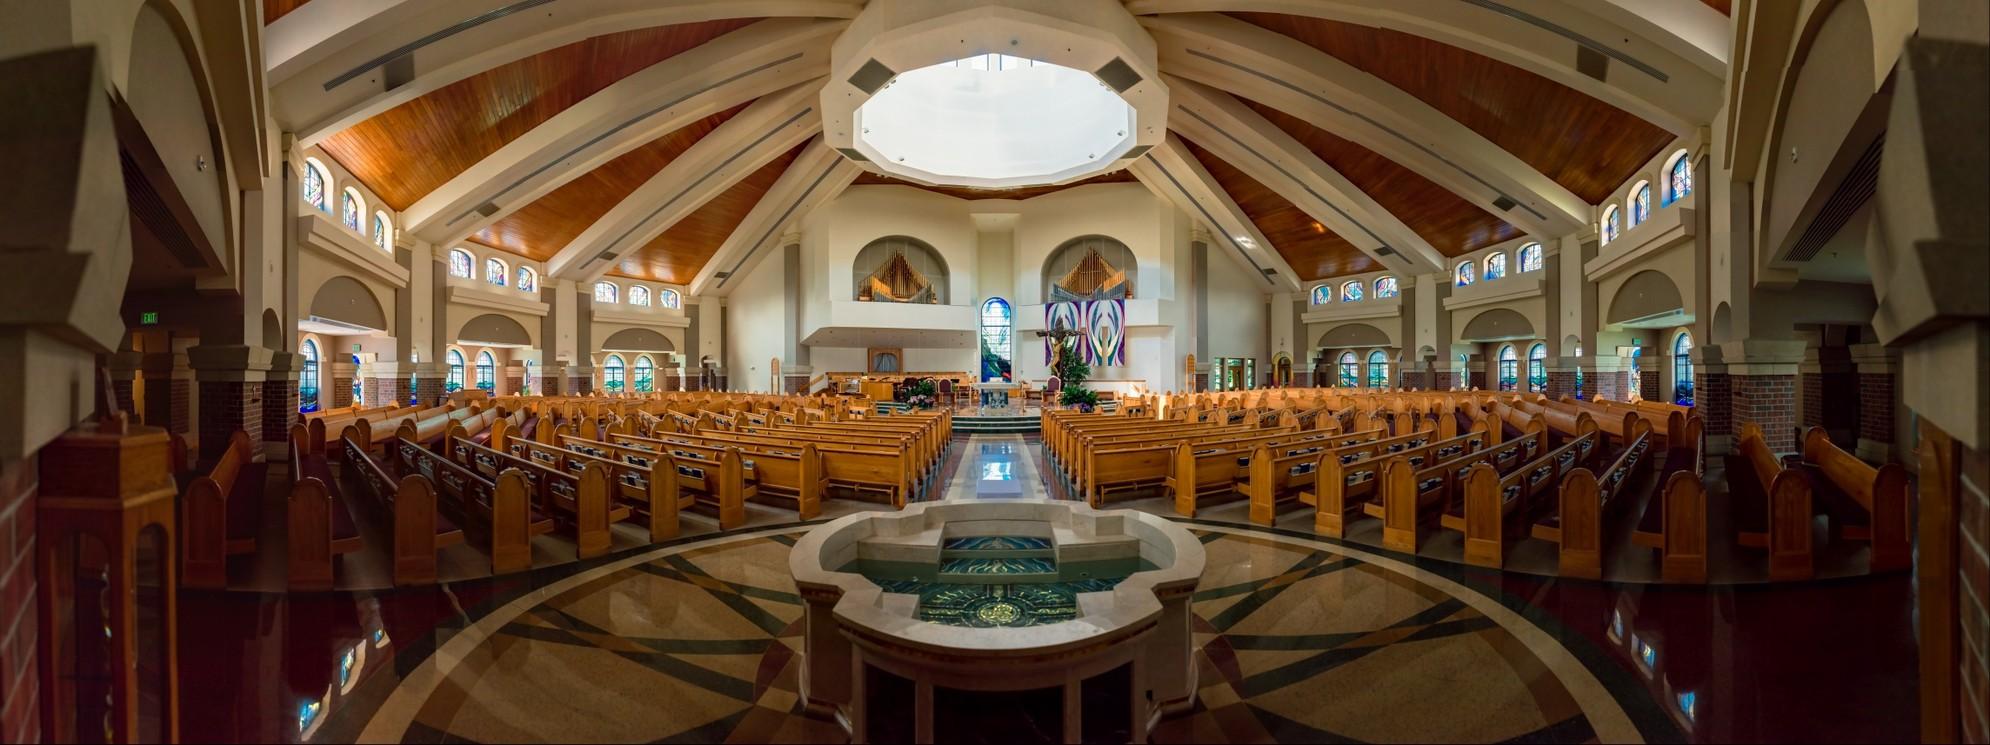 St Vincent de Paul - Fort Wayne, IN